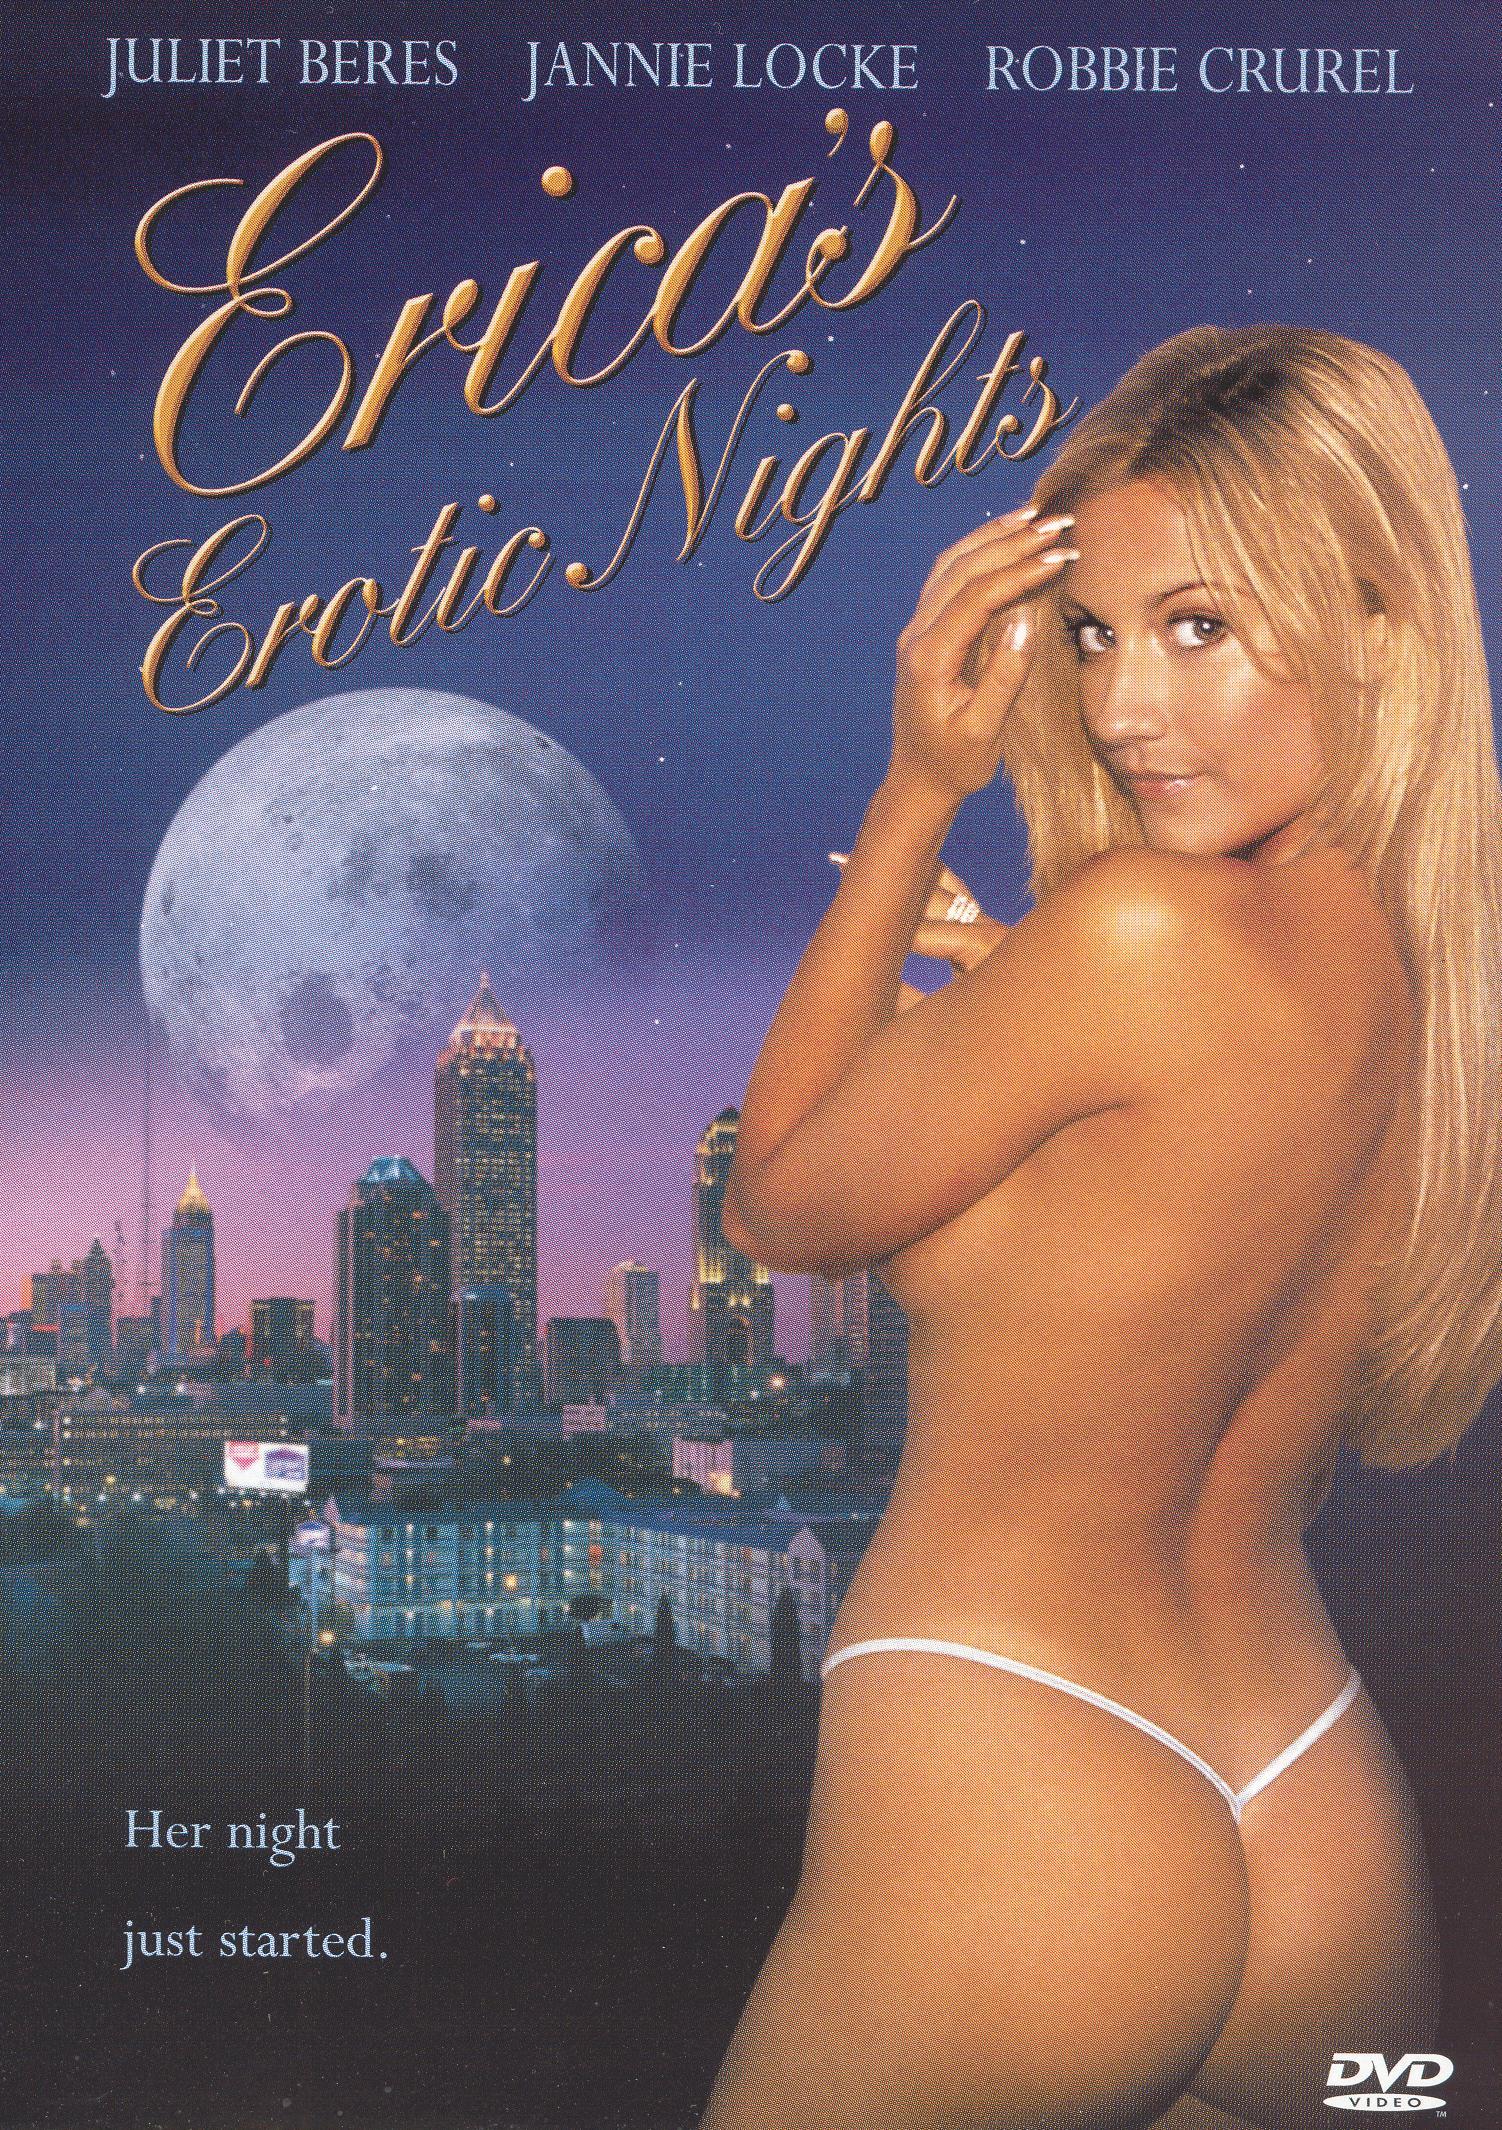 Erica's Erotic Nights